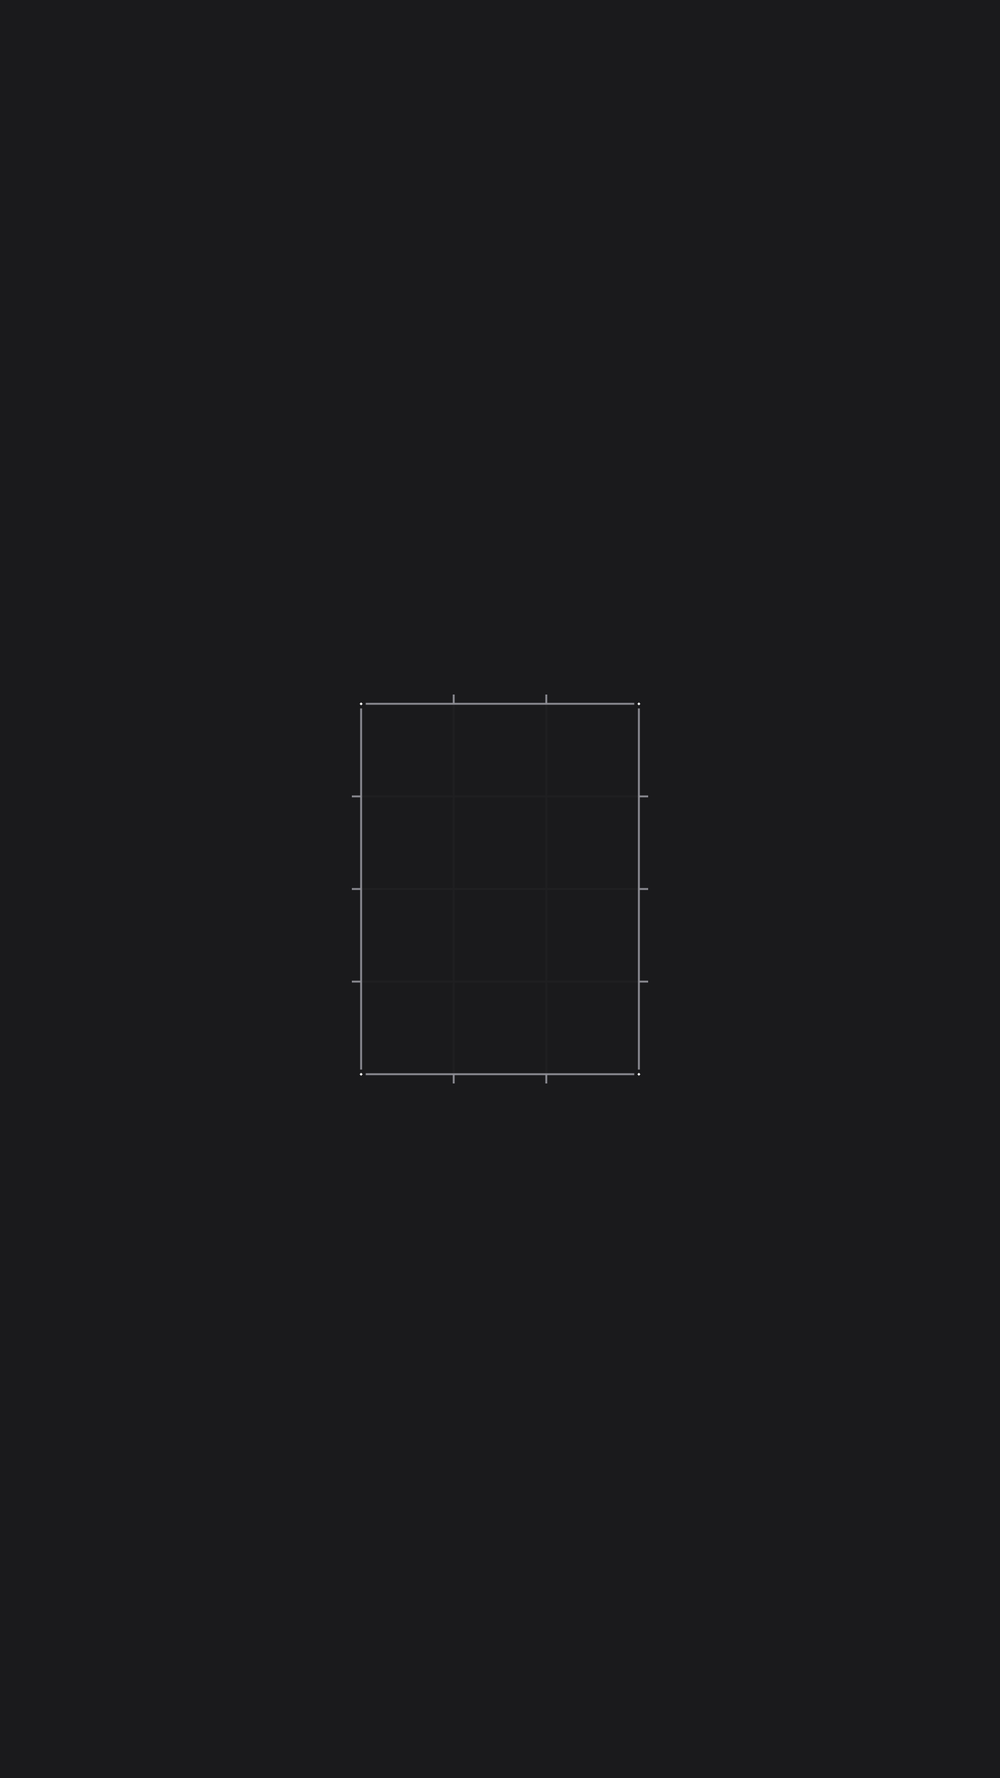 puzzle-depth-13.png